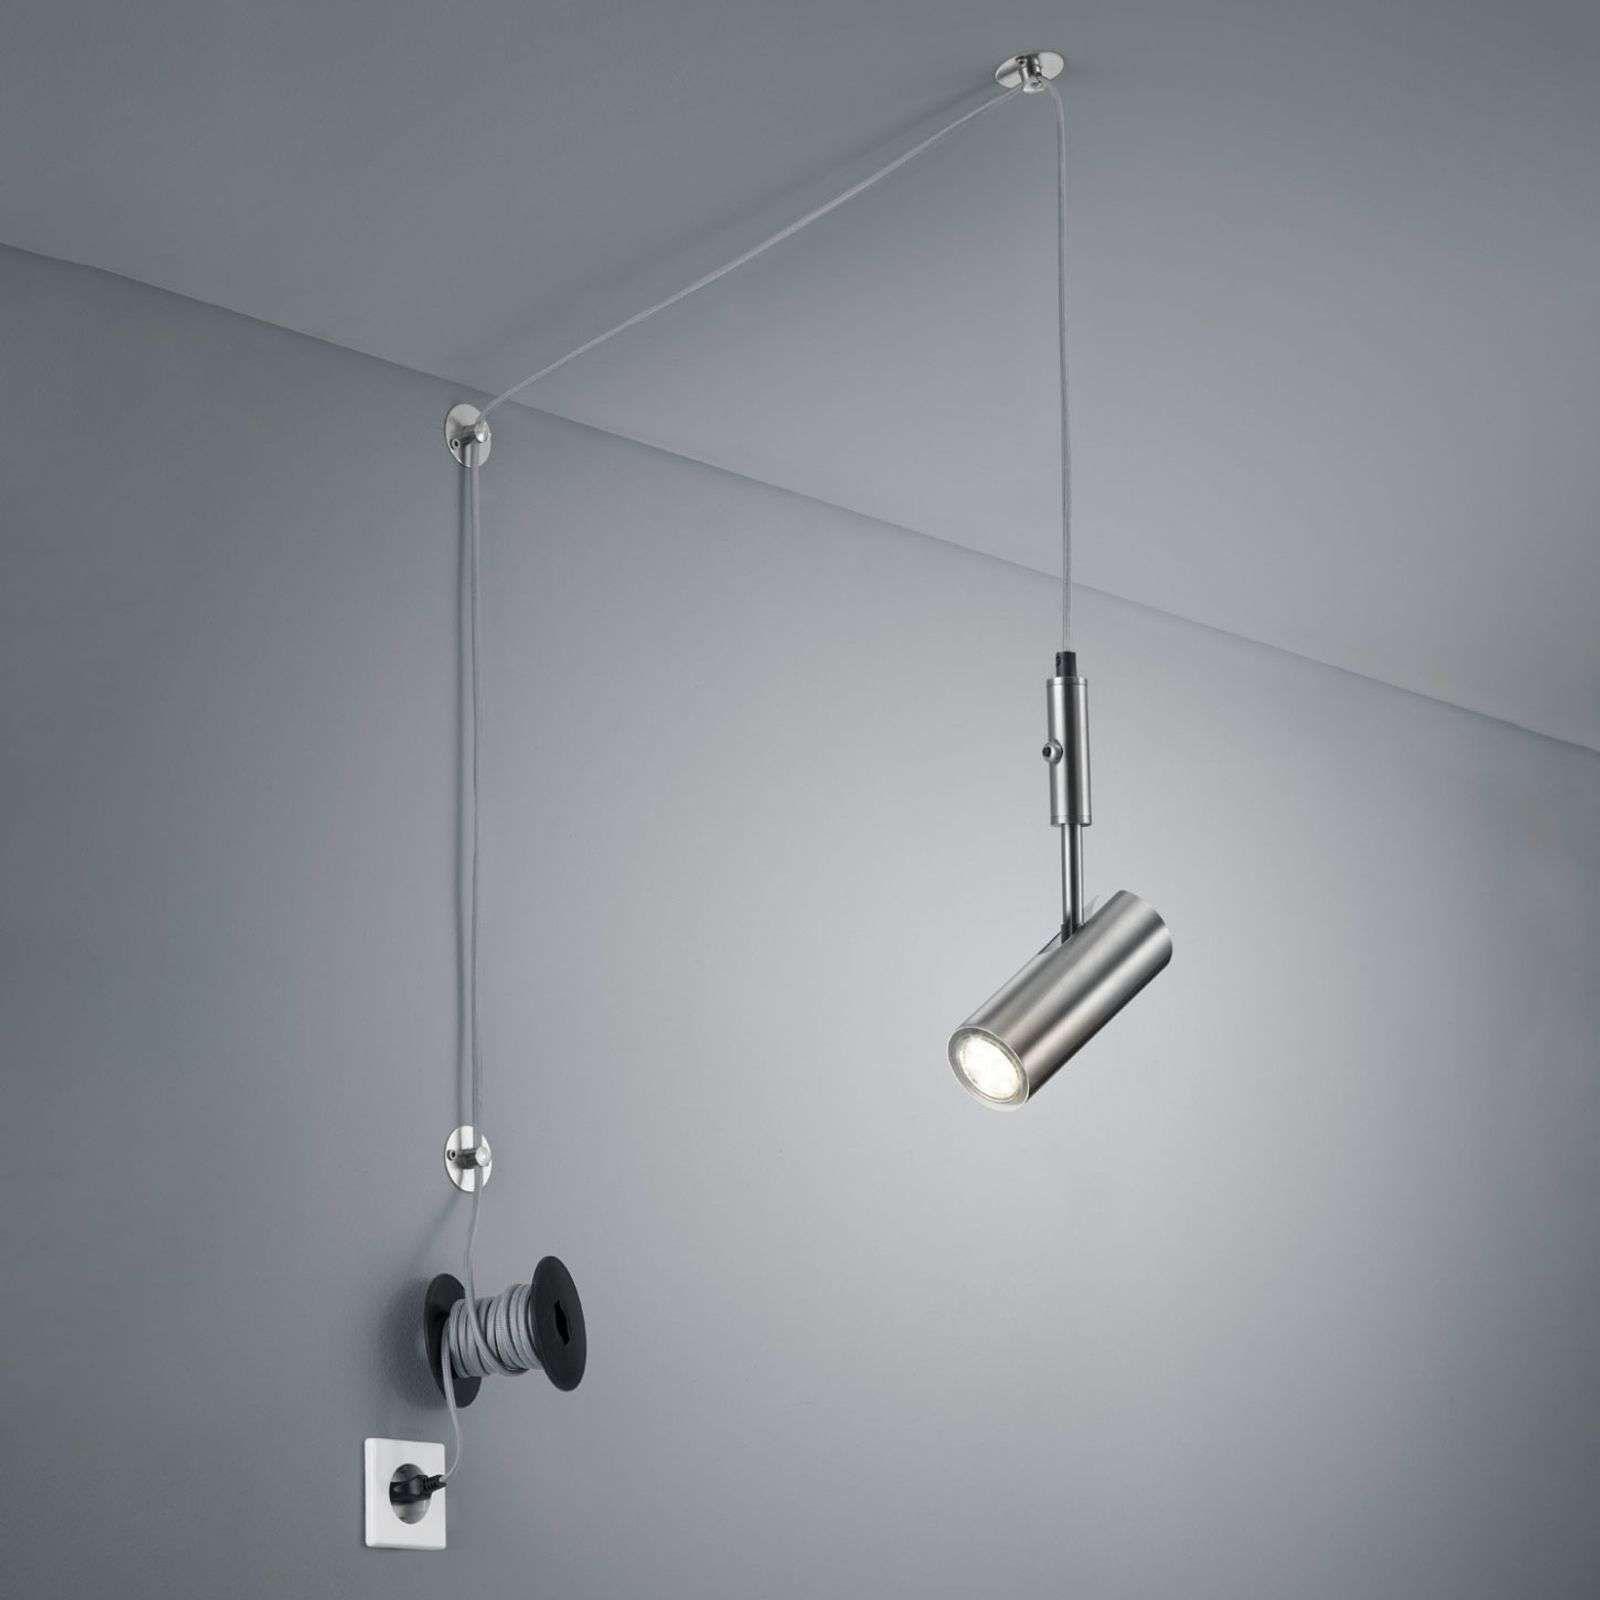 Led Lampe Dimmbar Machen Design Pendelleuchten Esszimmer Led